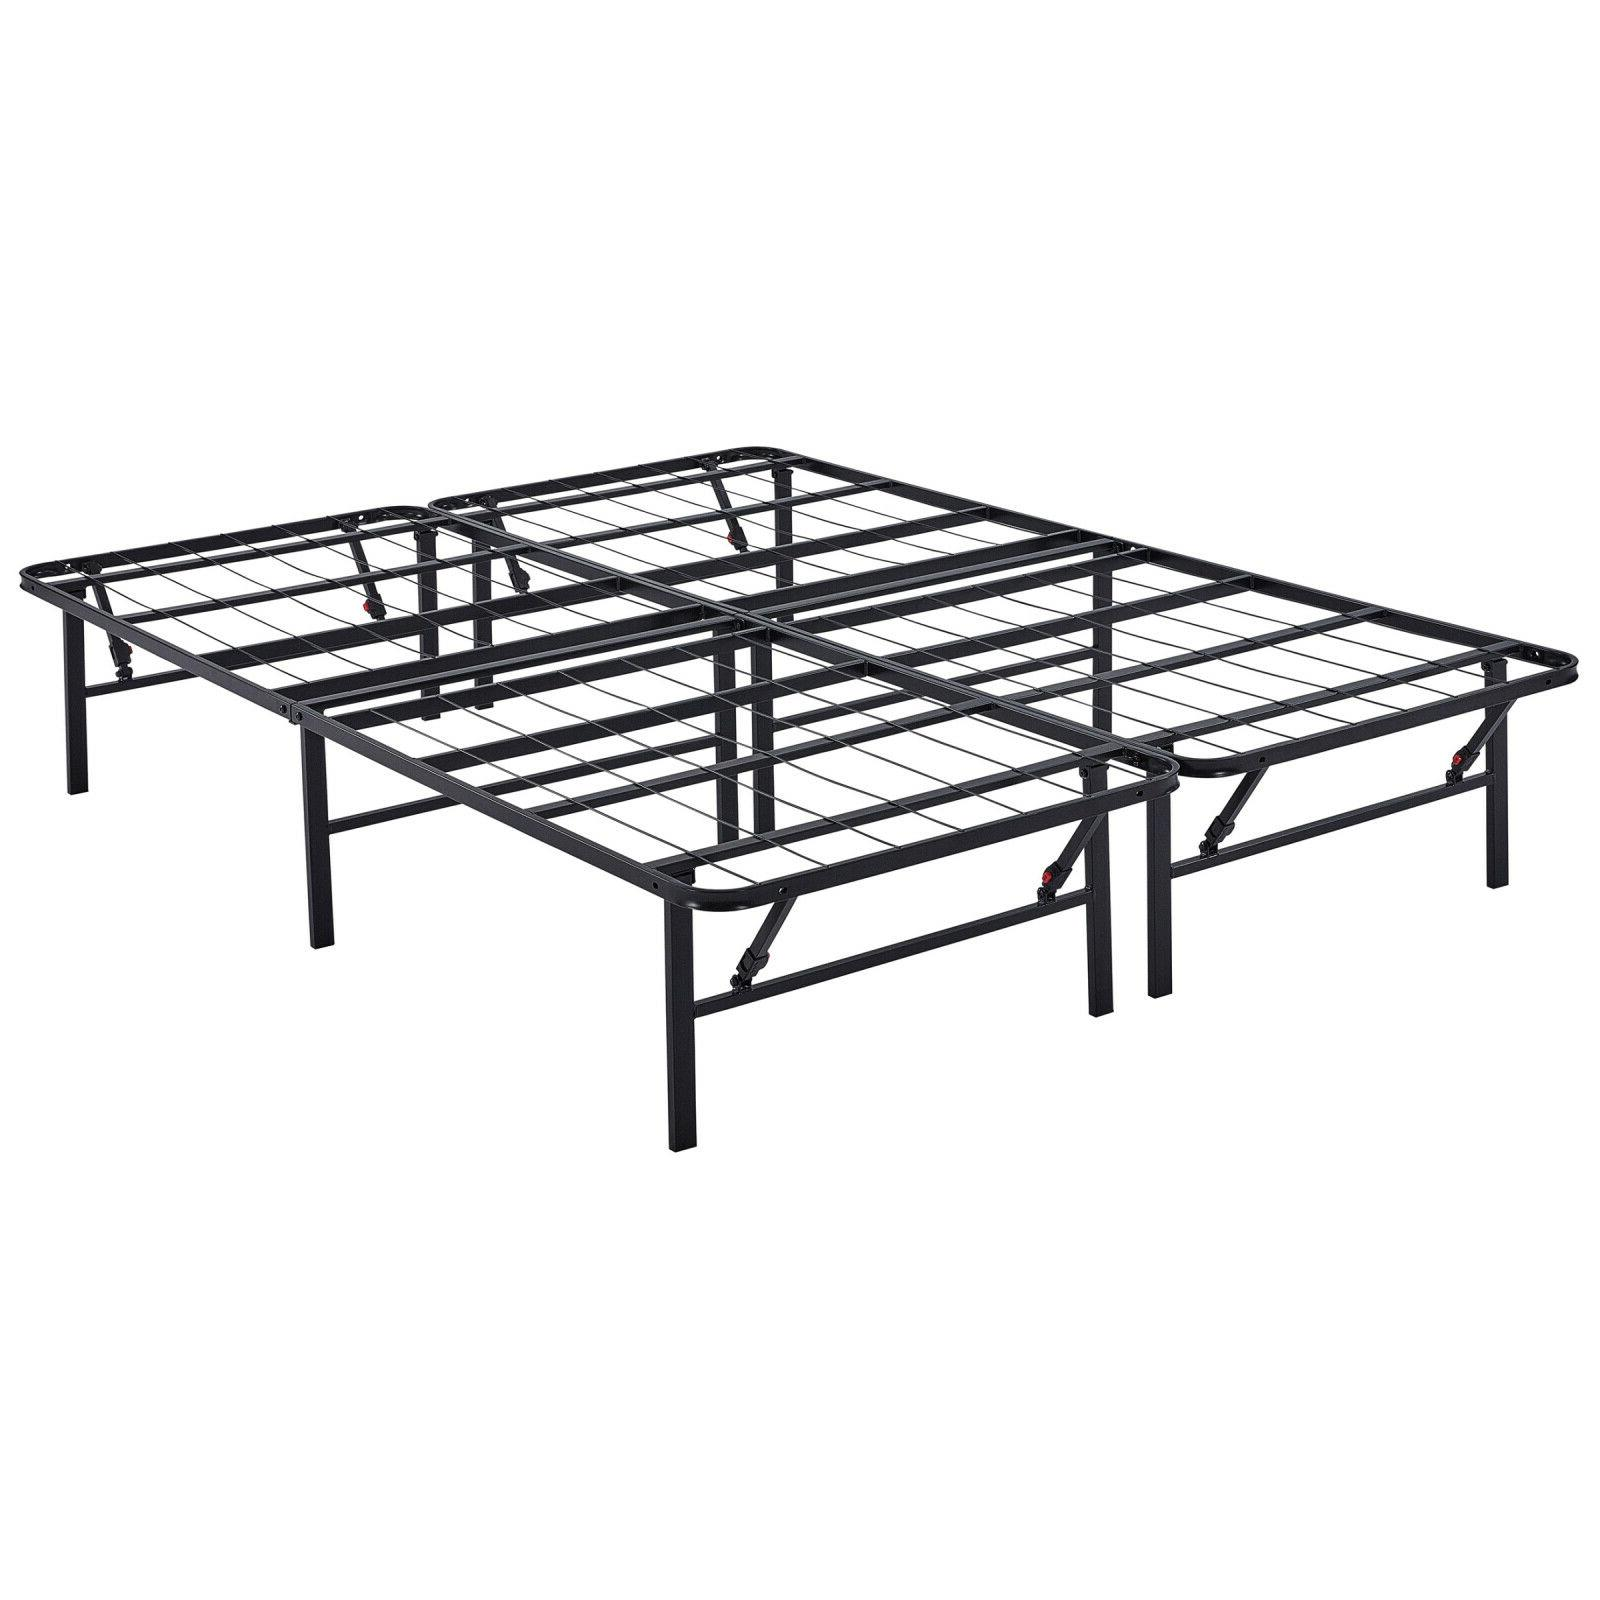 Bi-Fold Metal Platform Bed Frame Foldable Mattress No Box Tw